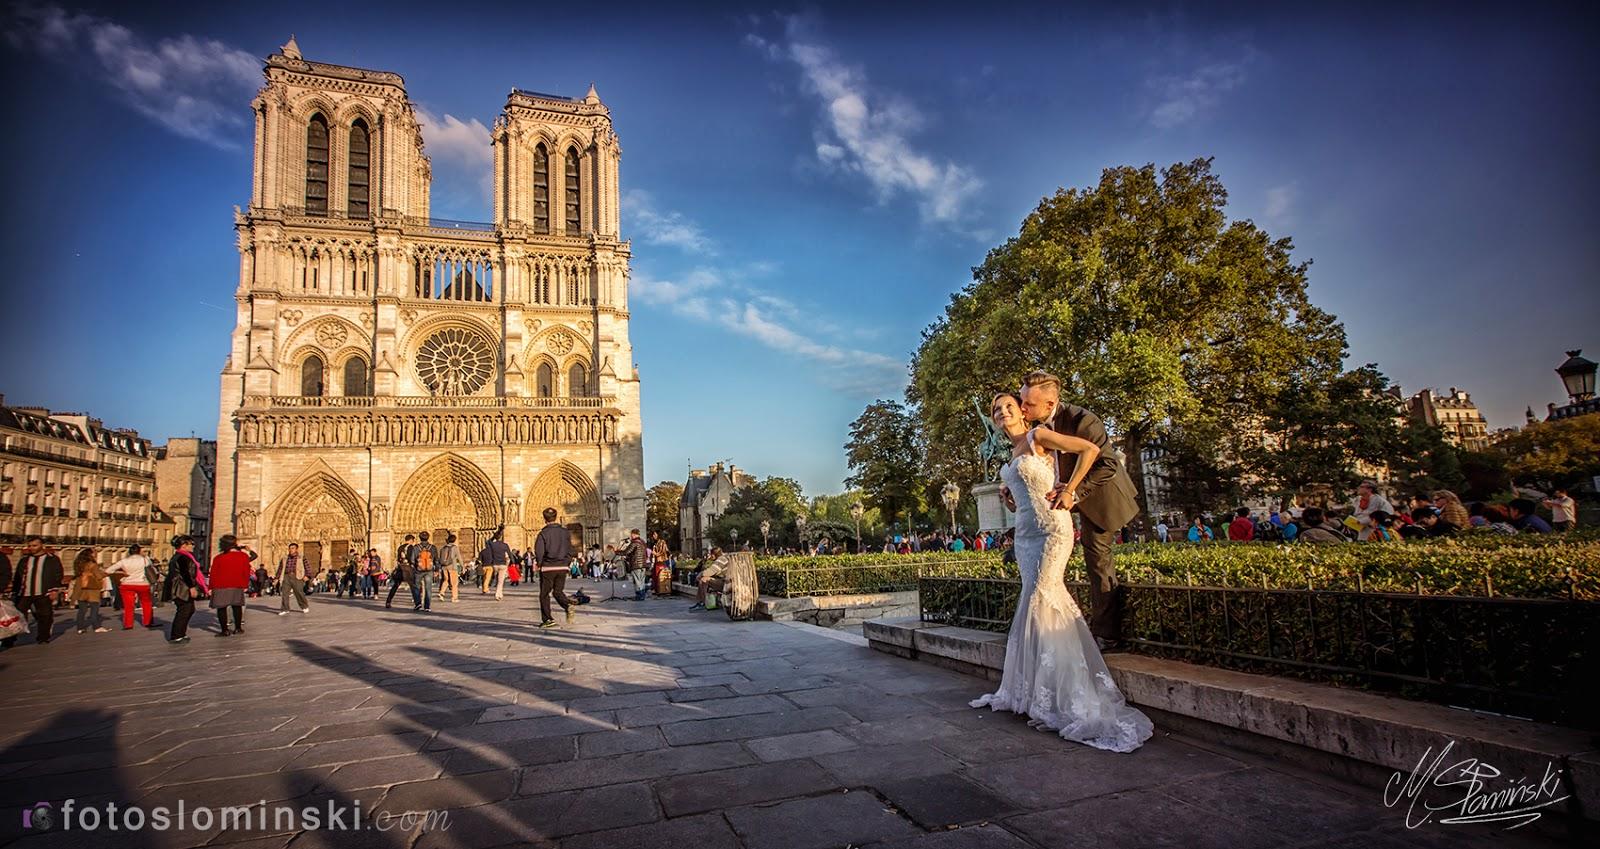 Katedra #NotreDame #Paryż - Sesja #ślubna - Fotoslominski.Com